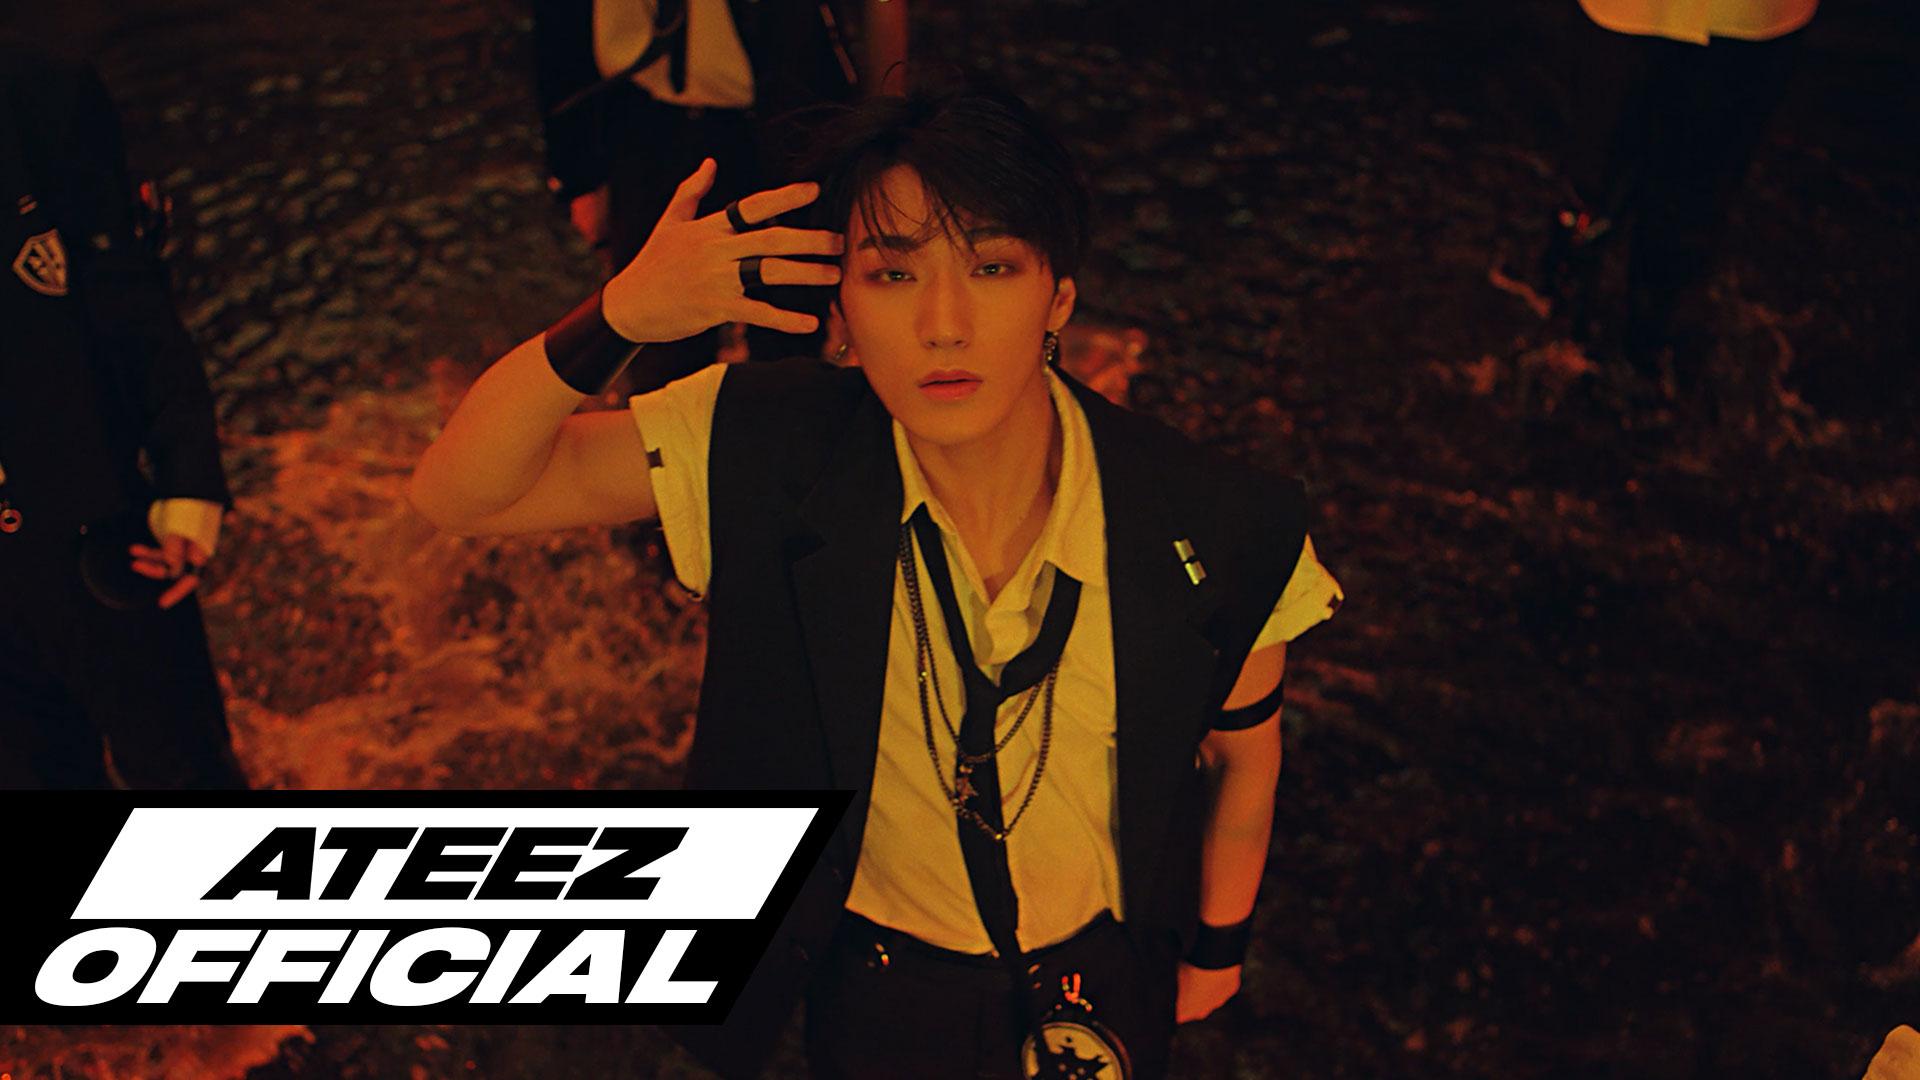 ATEEZ(에이티즈) - 'INCEPTION' Official MV